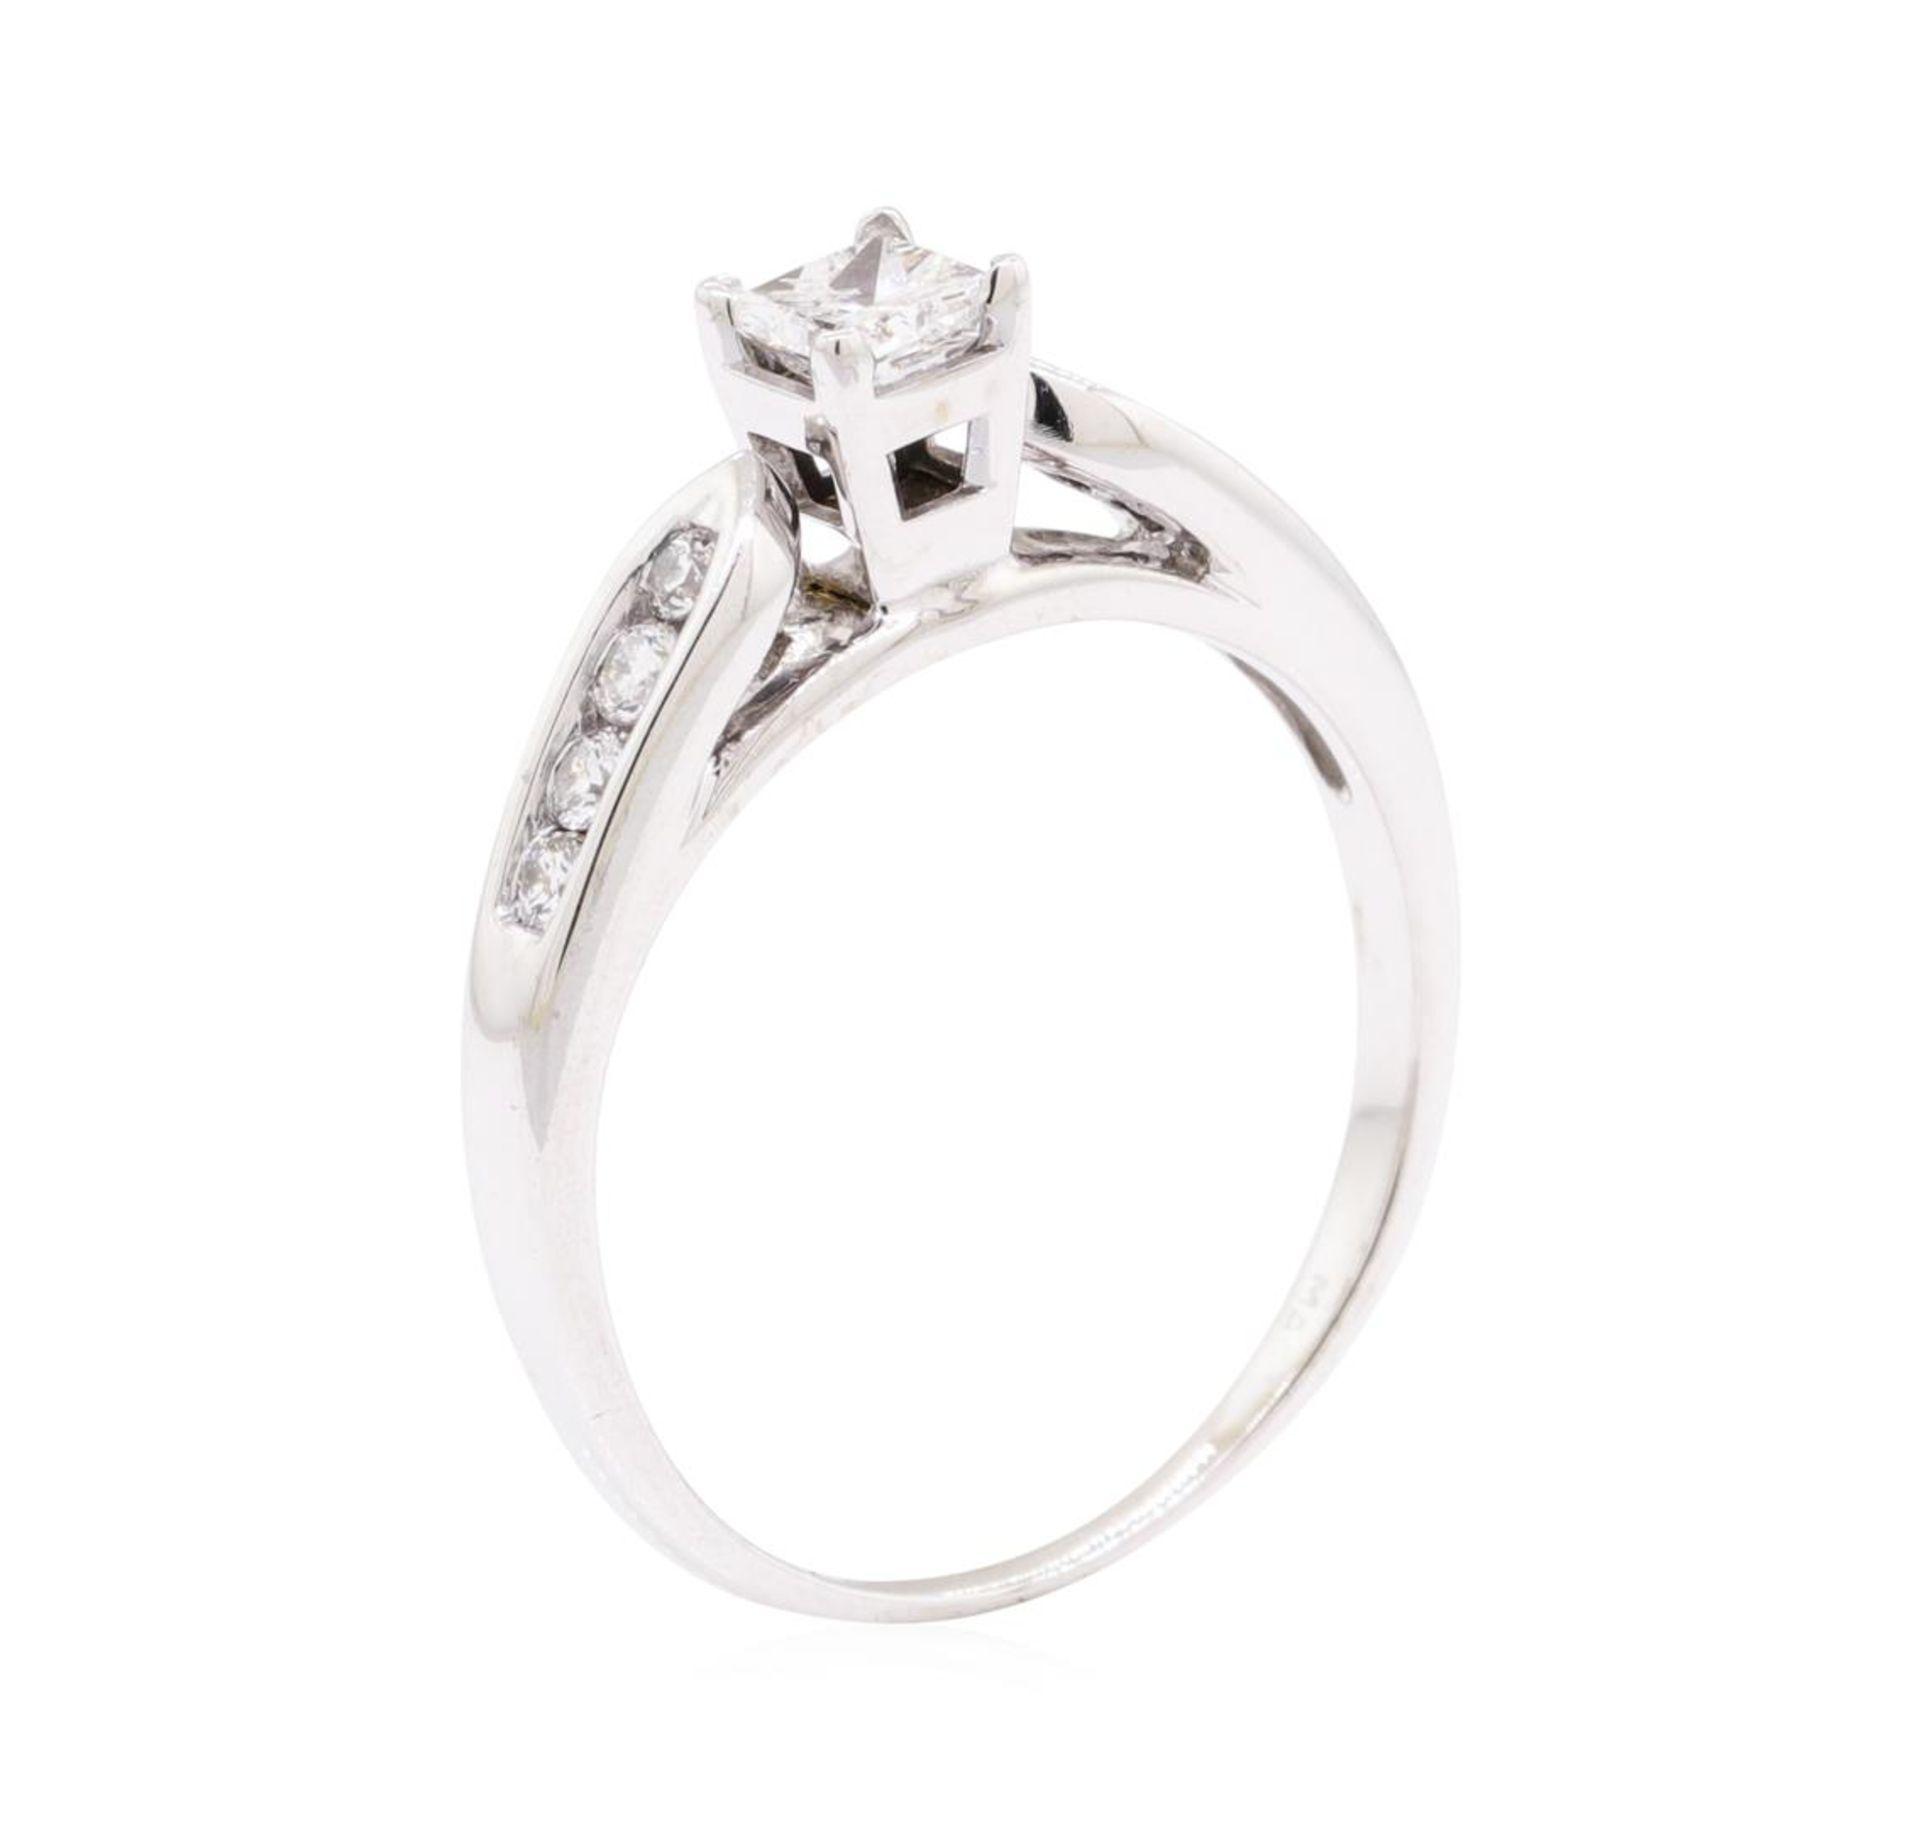 0.70 ctw Diamond Ring - 14KT White Gold - Image 4 of 4